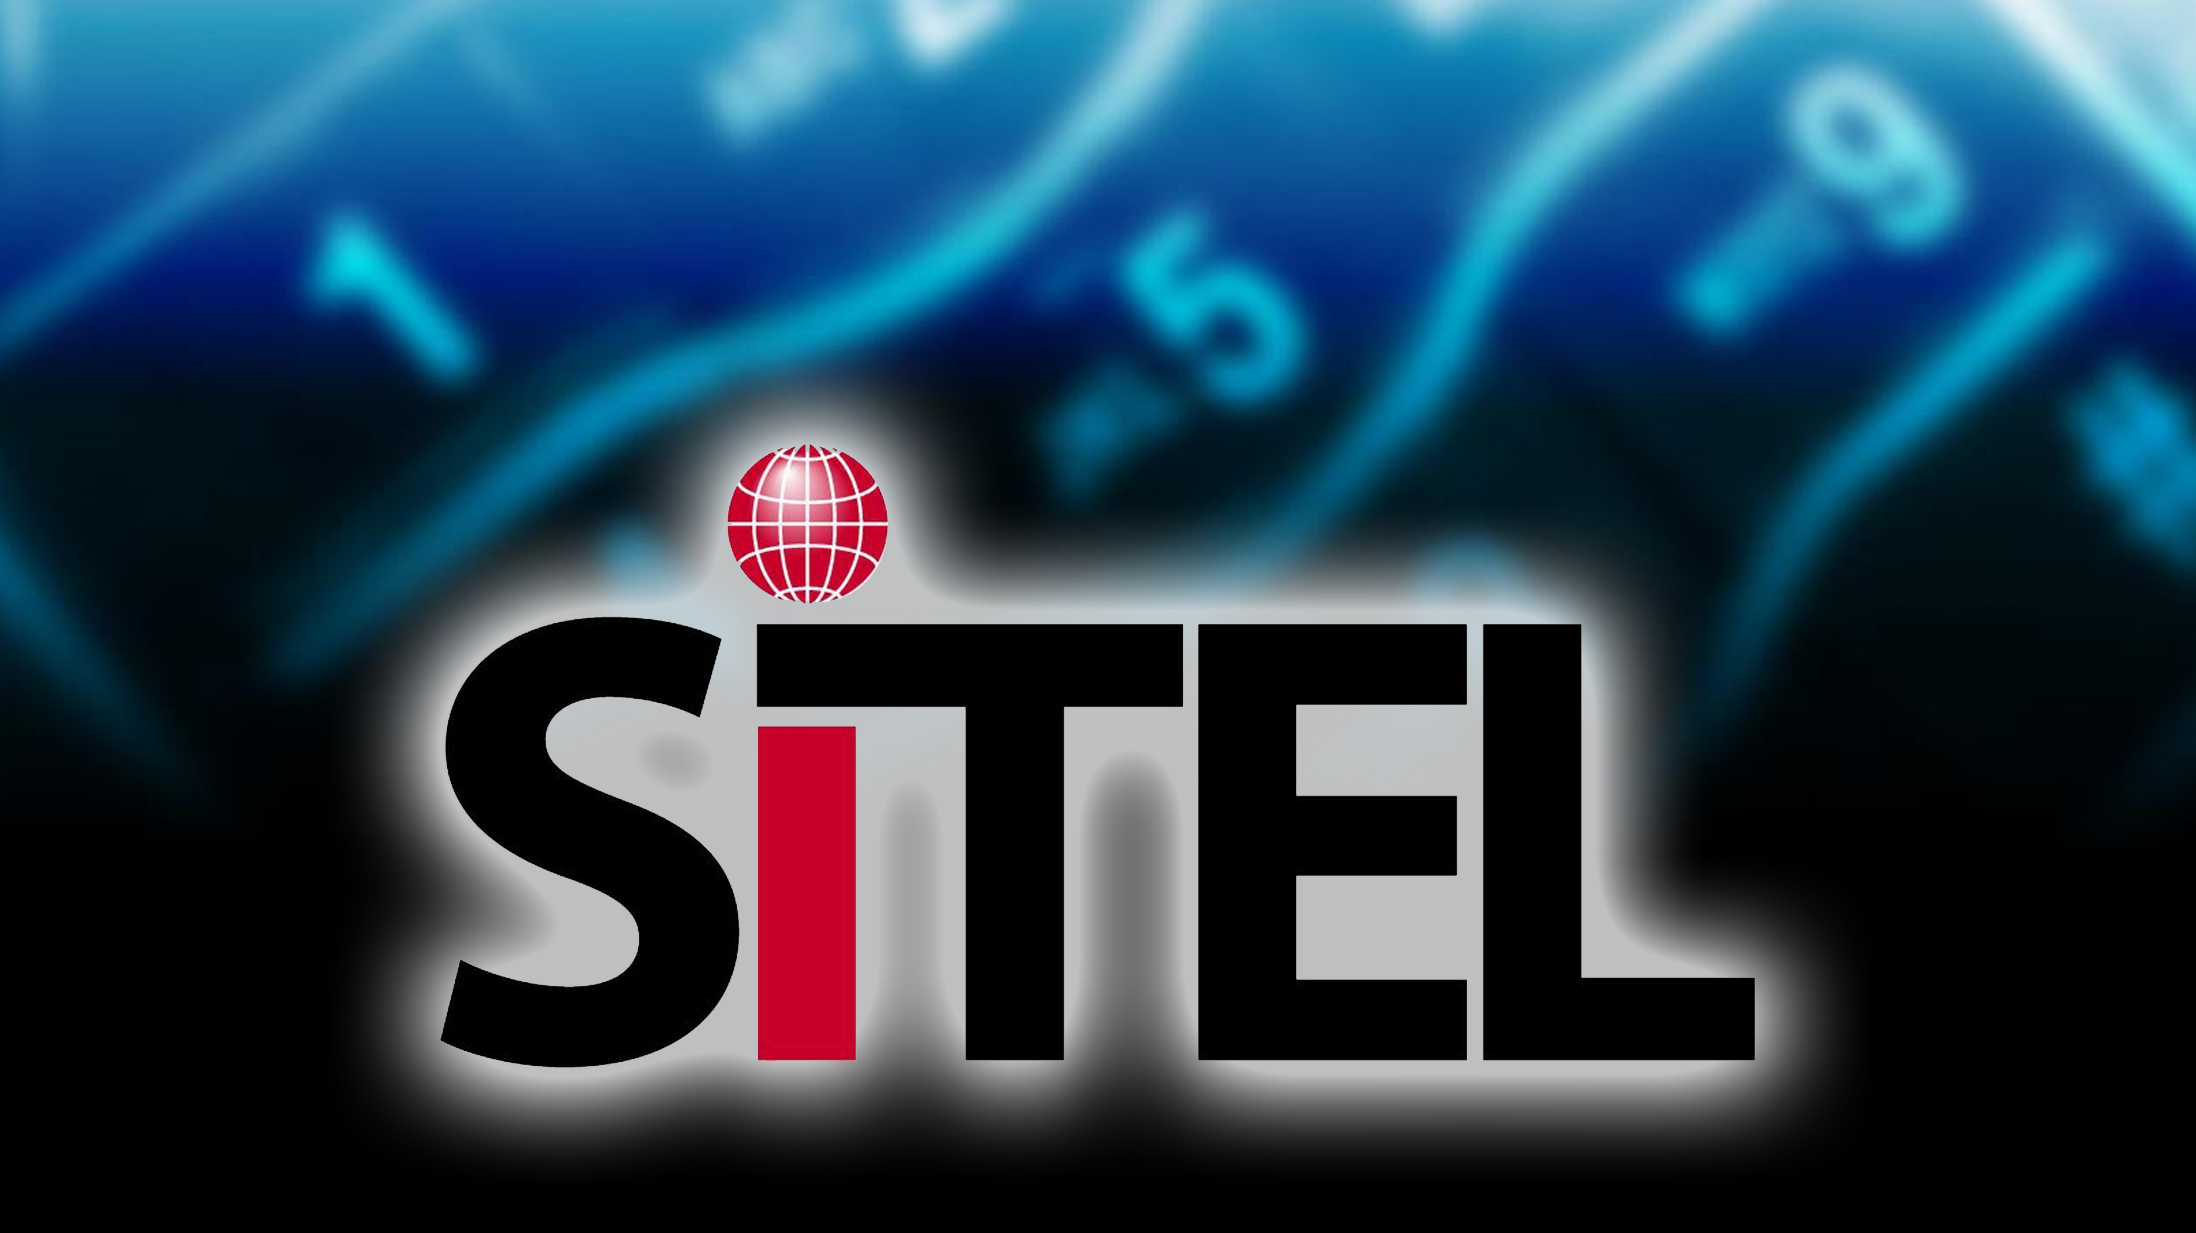 Sitel for web_1443023058146.jpg